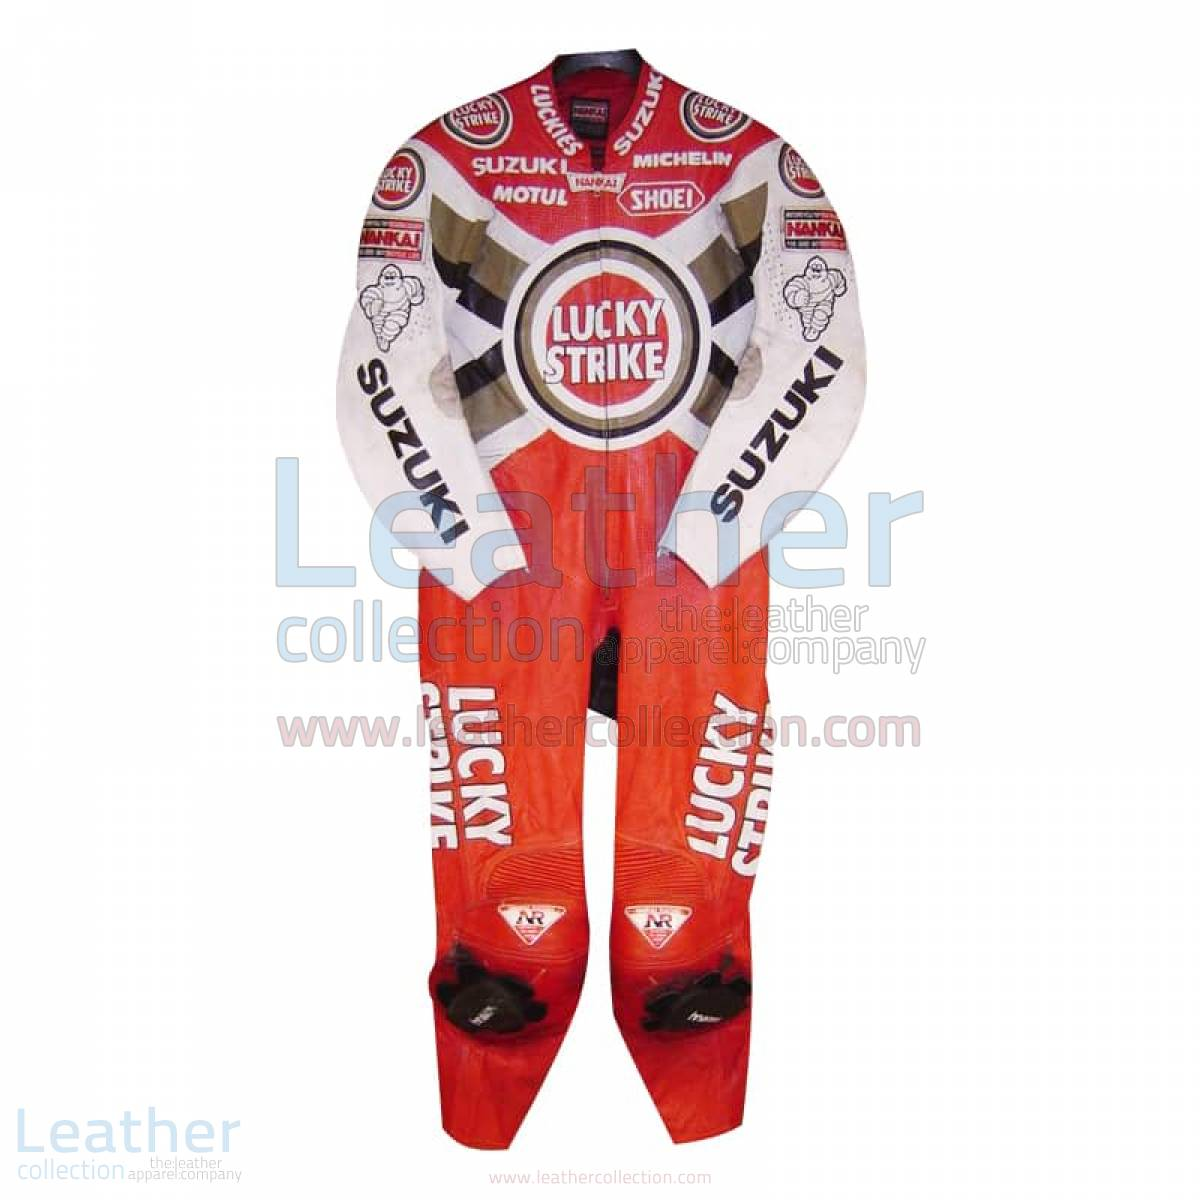 Daryl Beattie Suzuki Lucky Strike Leathers 1995 MotoGP